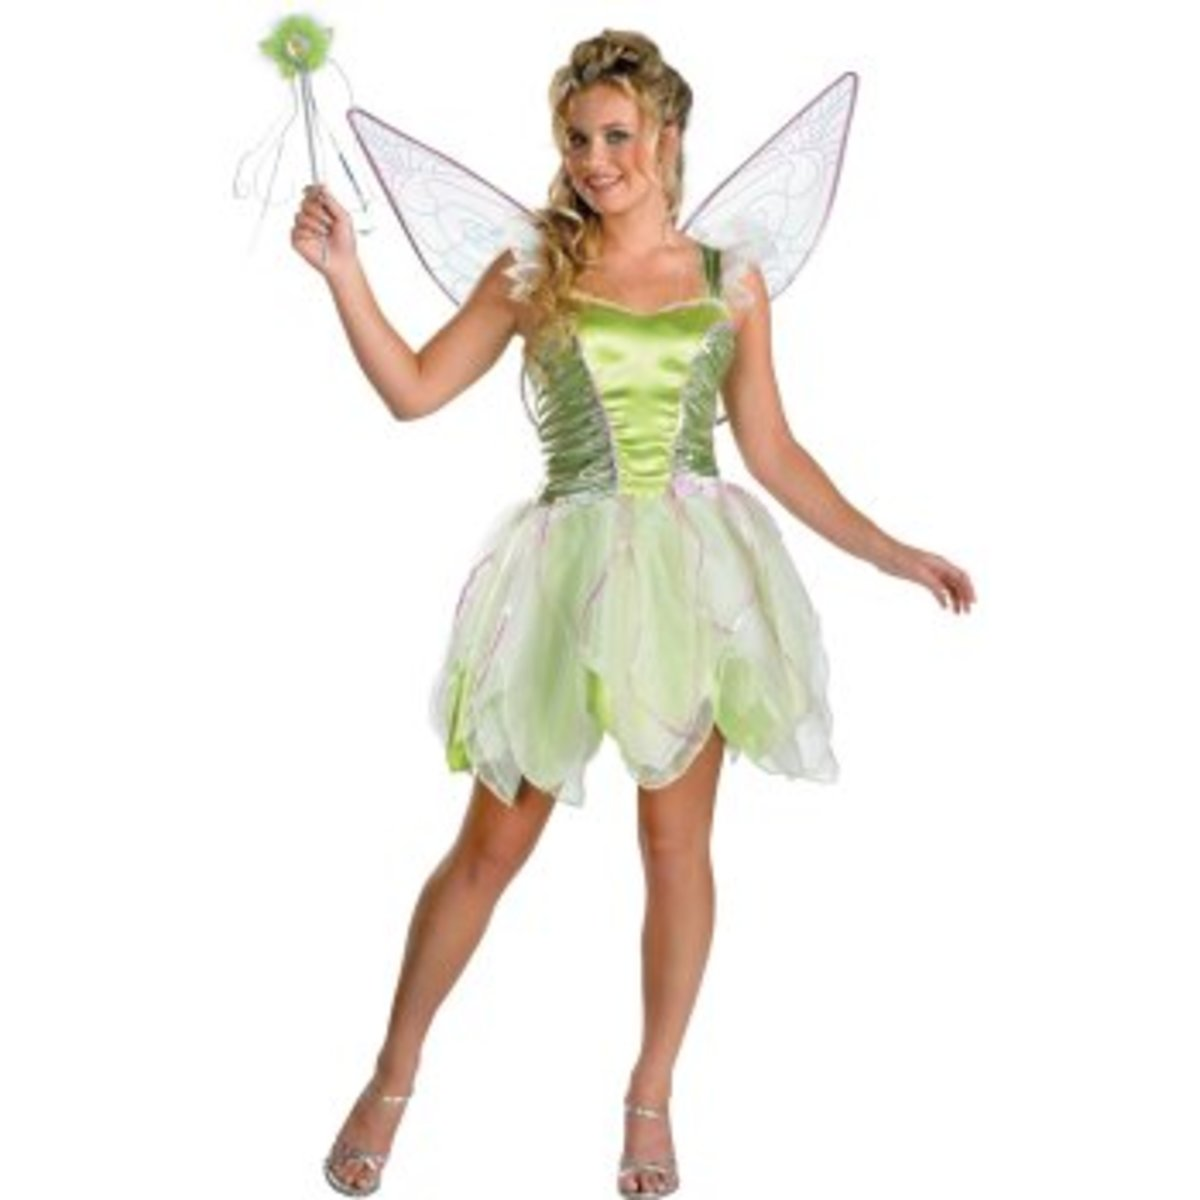 1695966 f520 Tags: green, Halloween, Halloween costumes, adult halloween costumes, adult ...